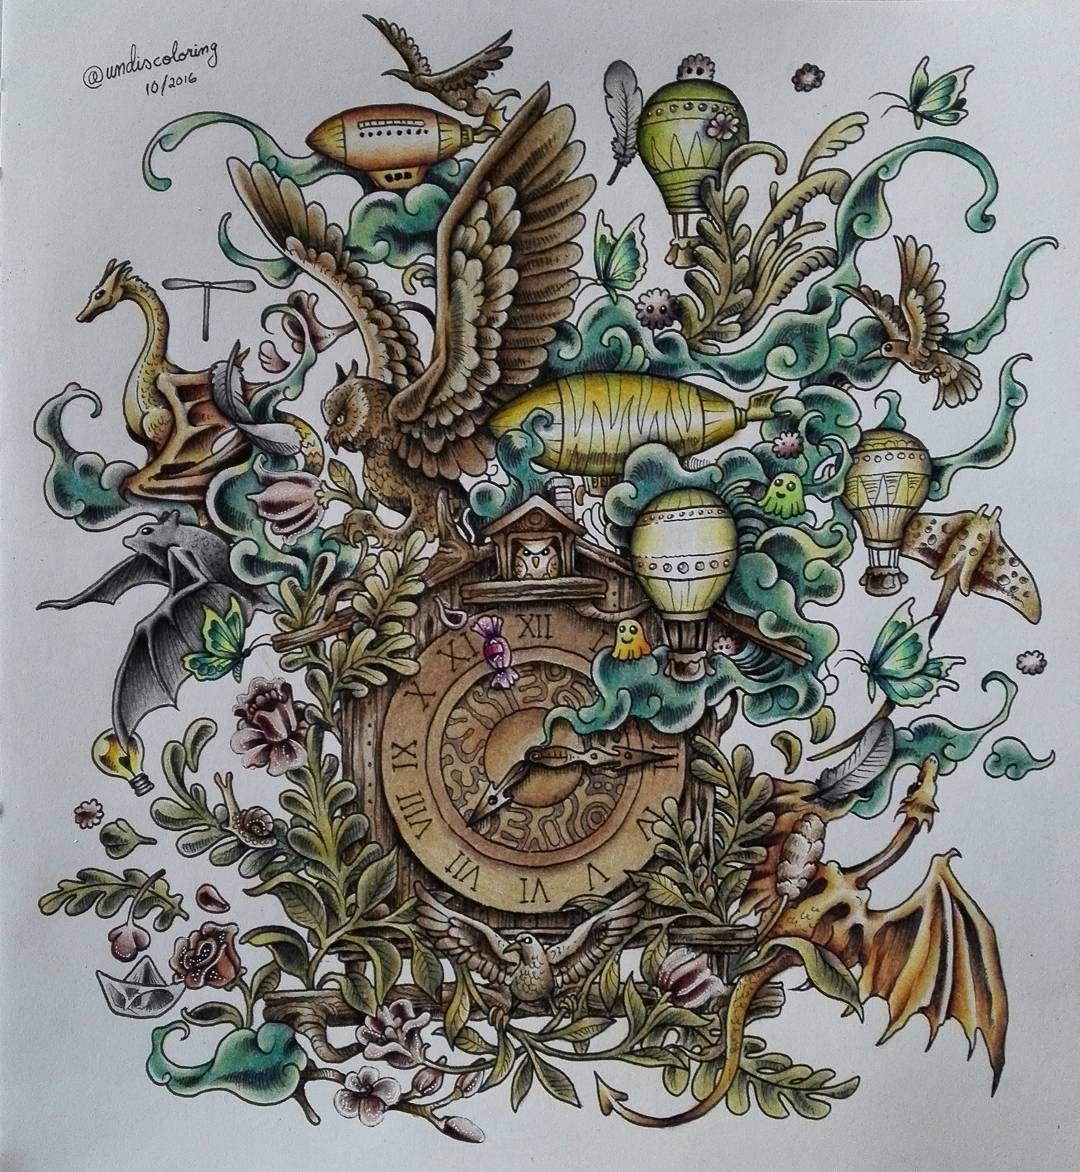 Find the Charizard!  + #imagimorphia #imagimorphiacolouringbook #kerbyrosanes #adultcoloring #adultcolouring #adultcoloringbook #adultcolouringbook #colouringforadults #coloringbook #colouringbook #coloring #colouring #aikuistenvärityskirja #värityskirja #väritys #coloringforadults #värityskirja #steampunk